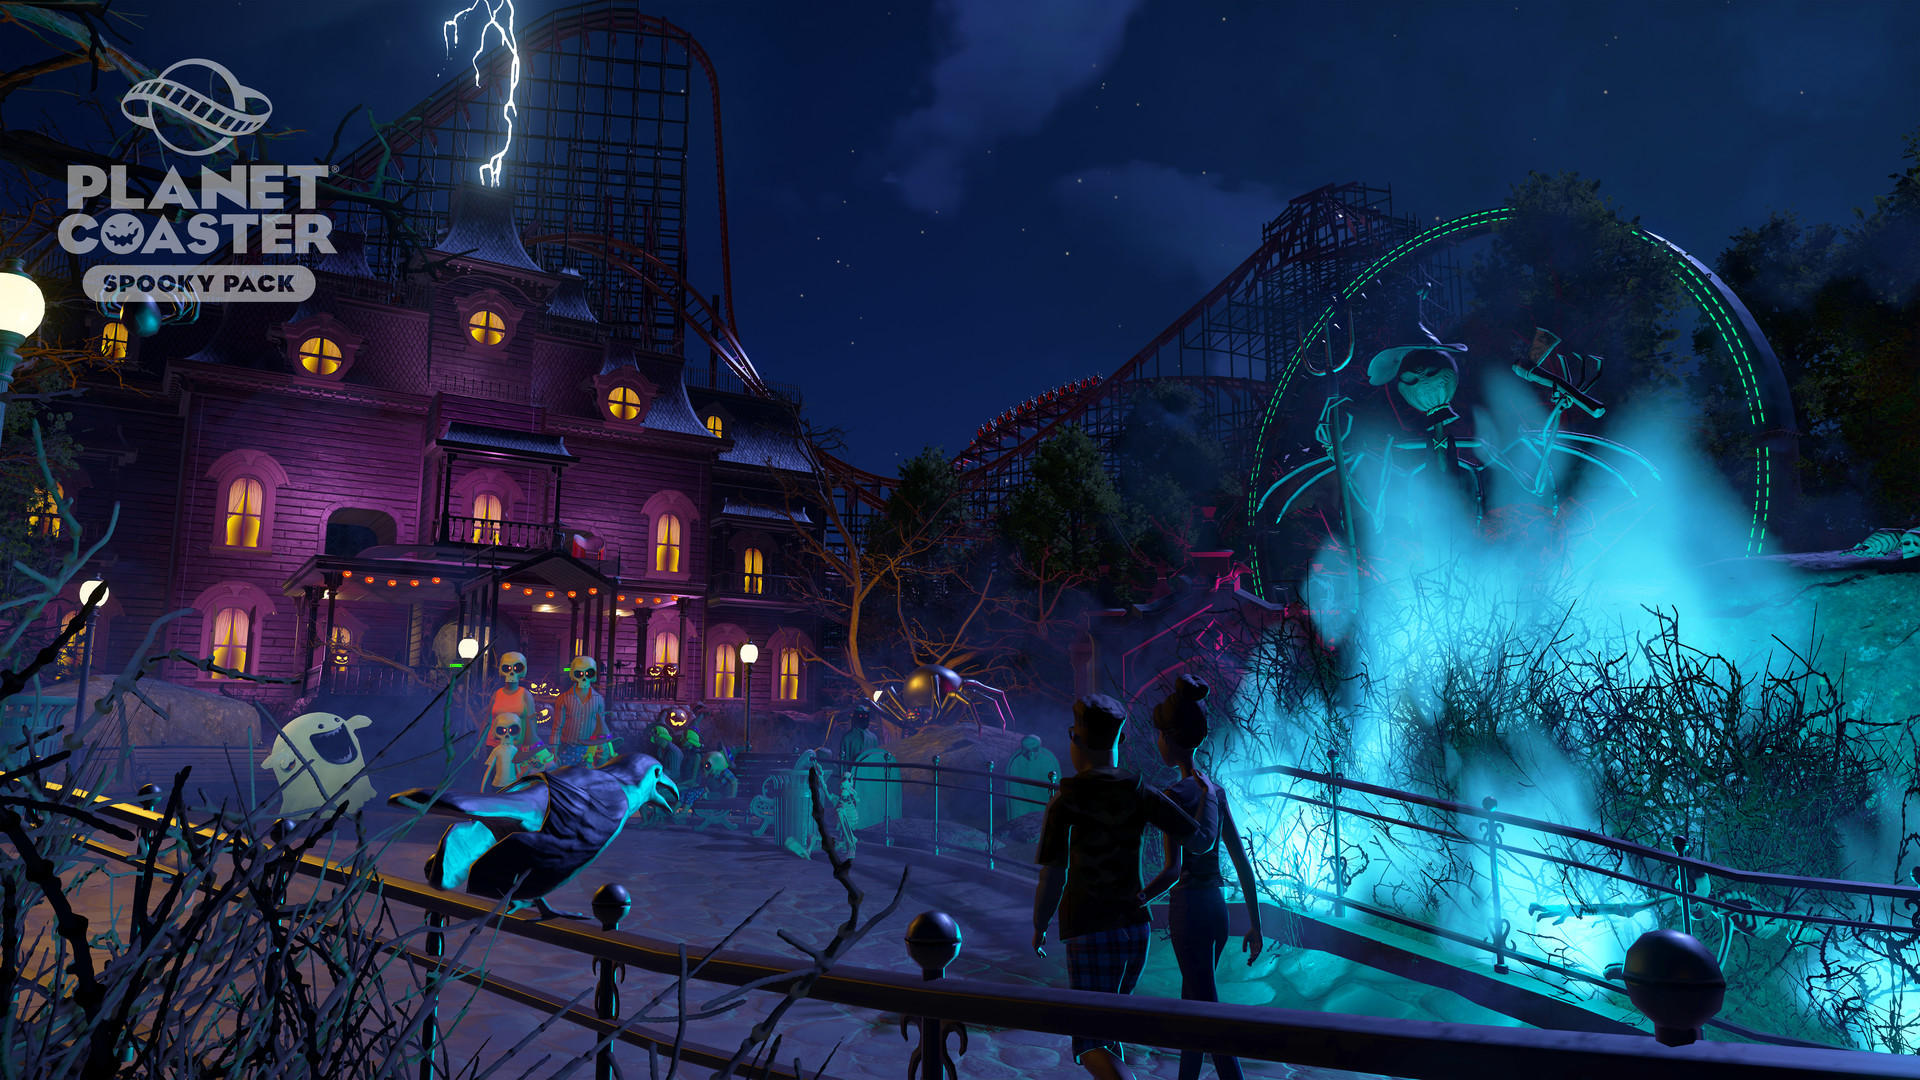 Planet Coaster - Spooky Pack screenshot